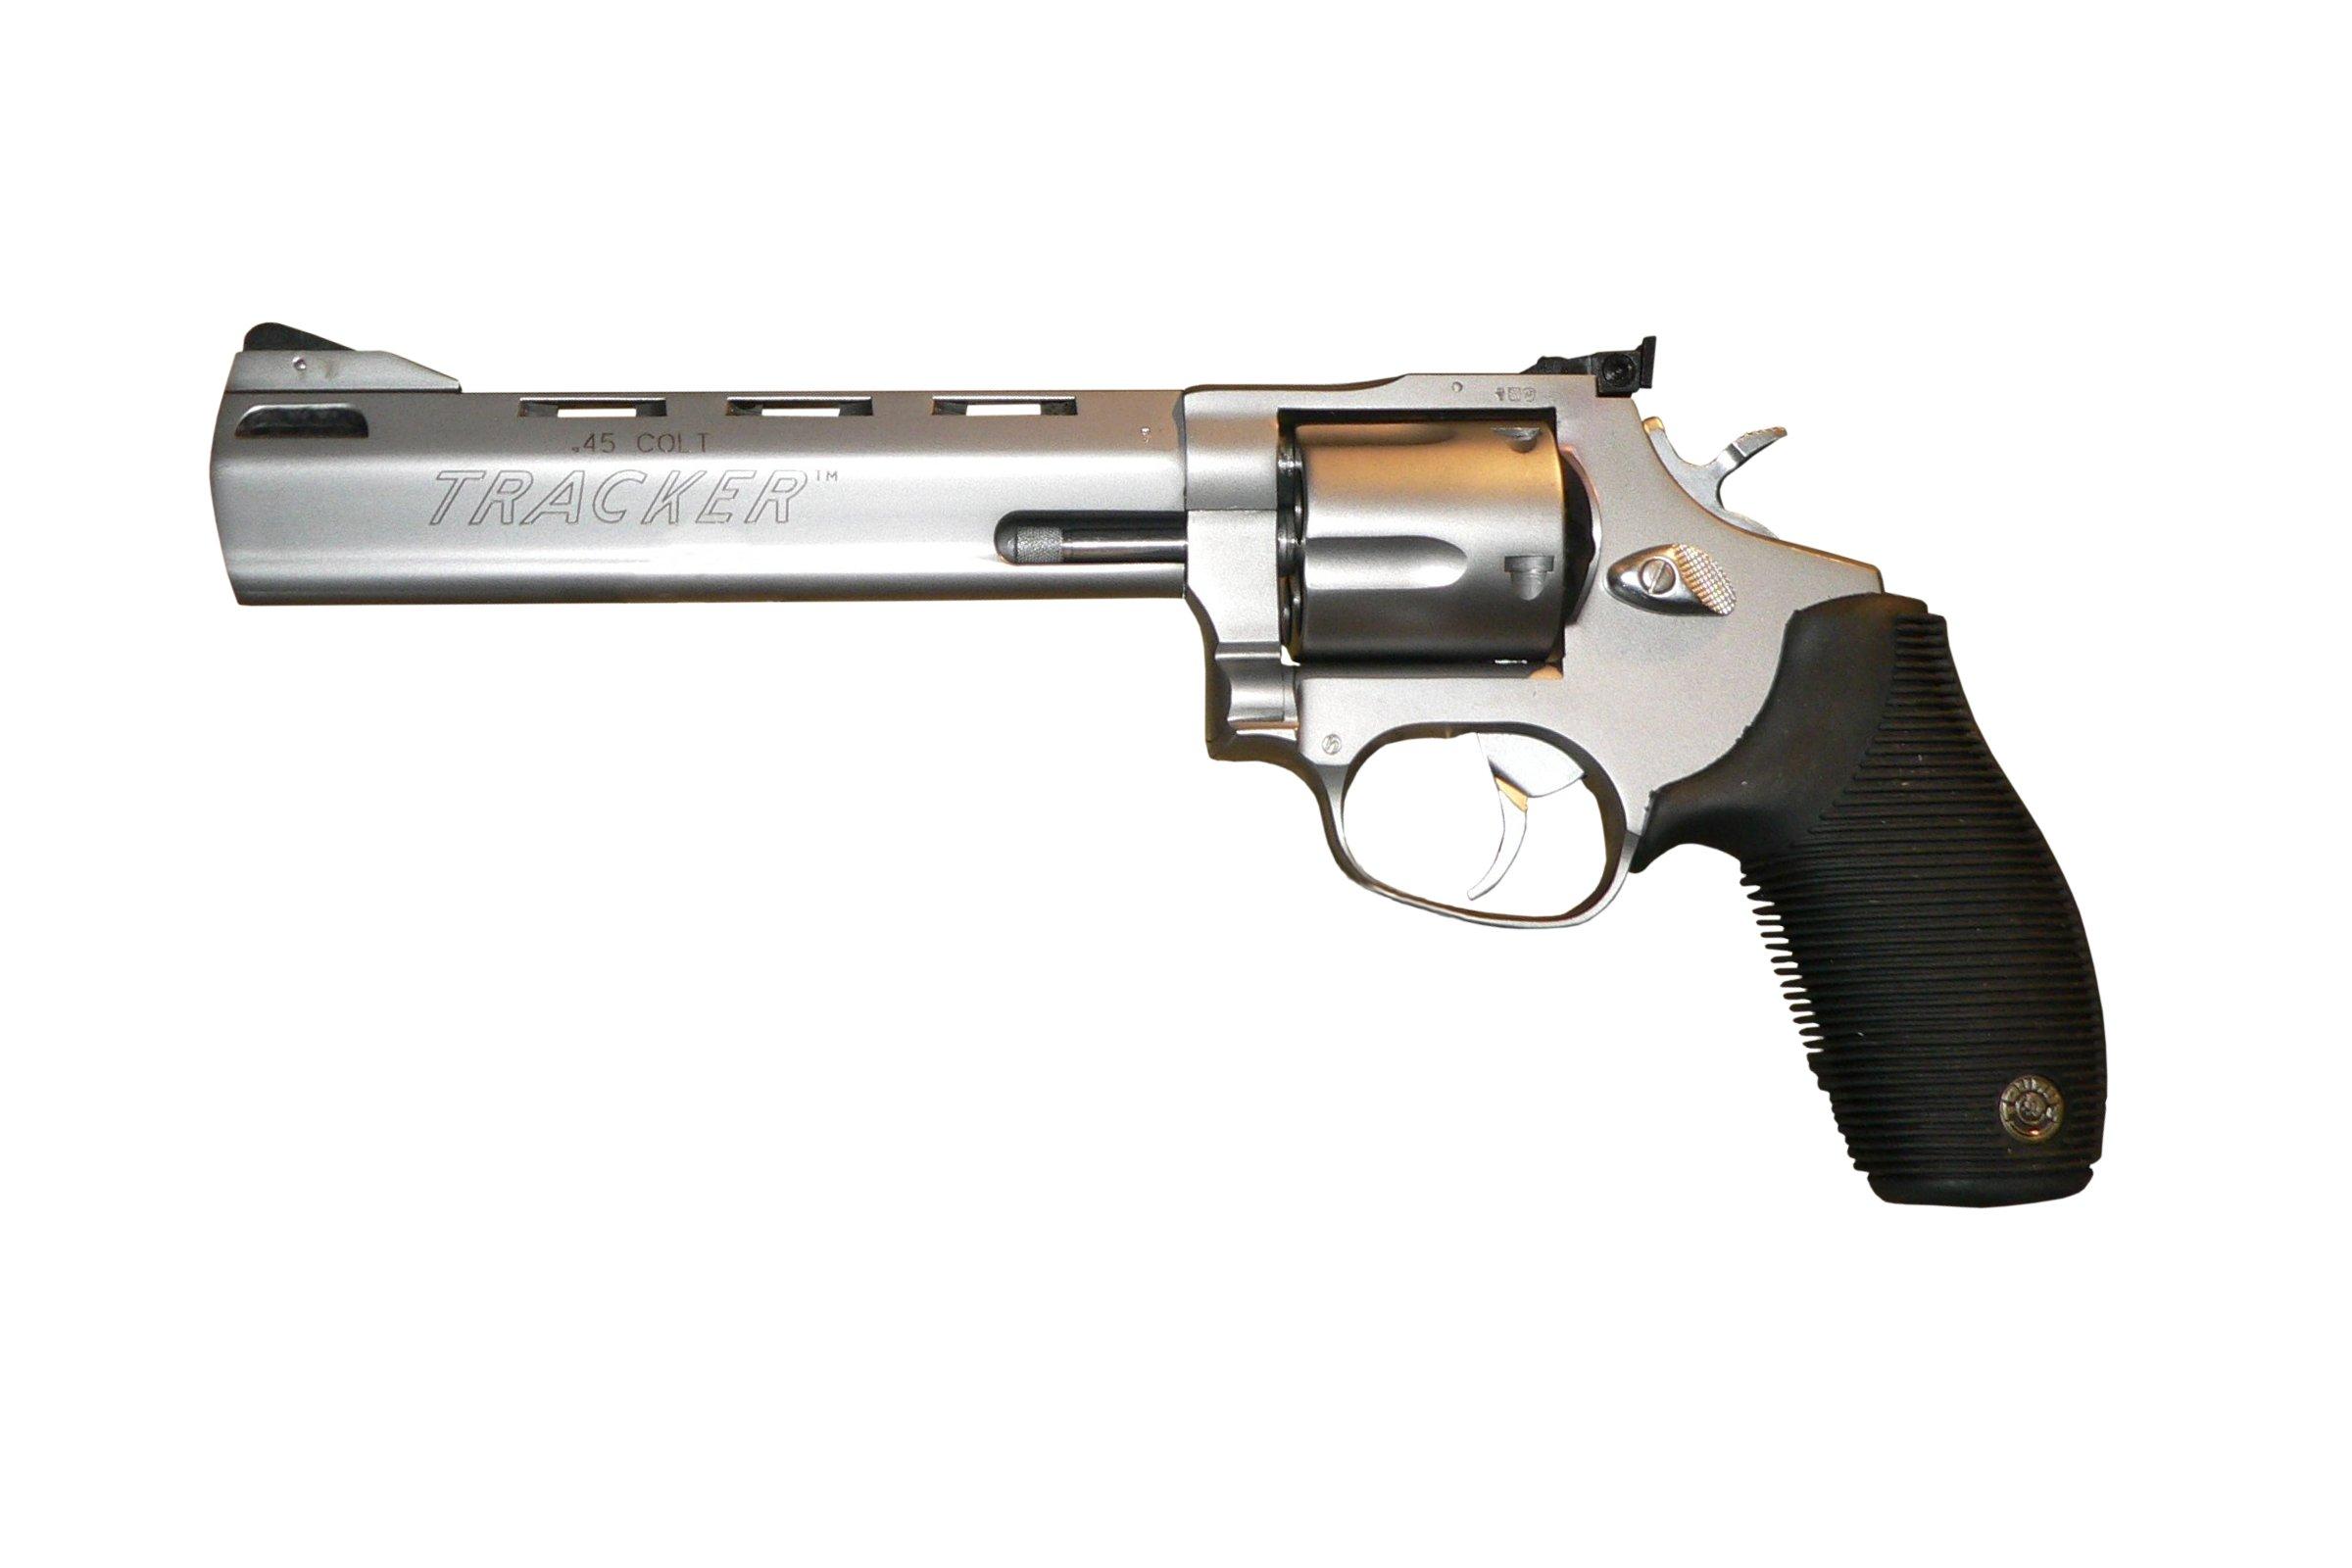 Owners Manual For Taurus Pistolowners Pistol Millennium 9mm Schematics